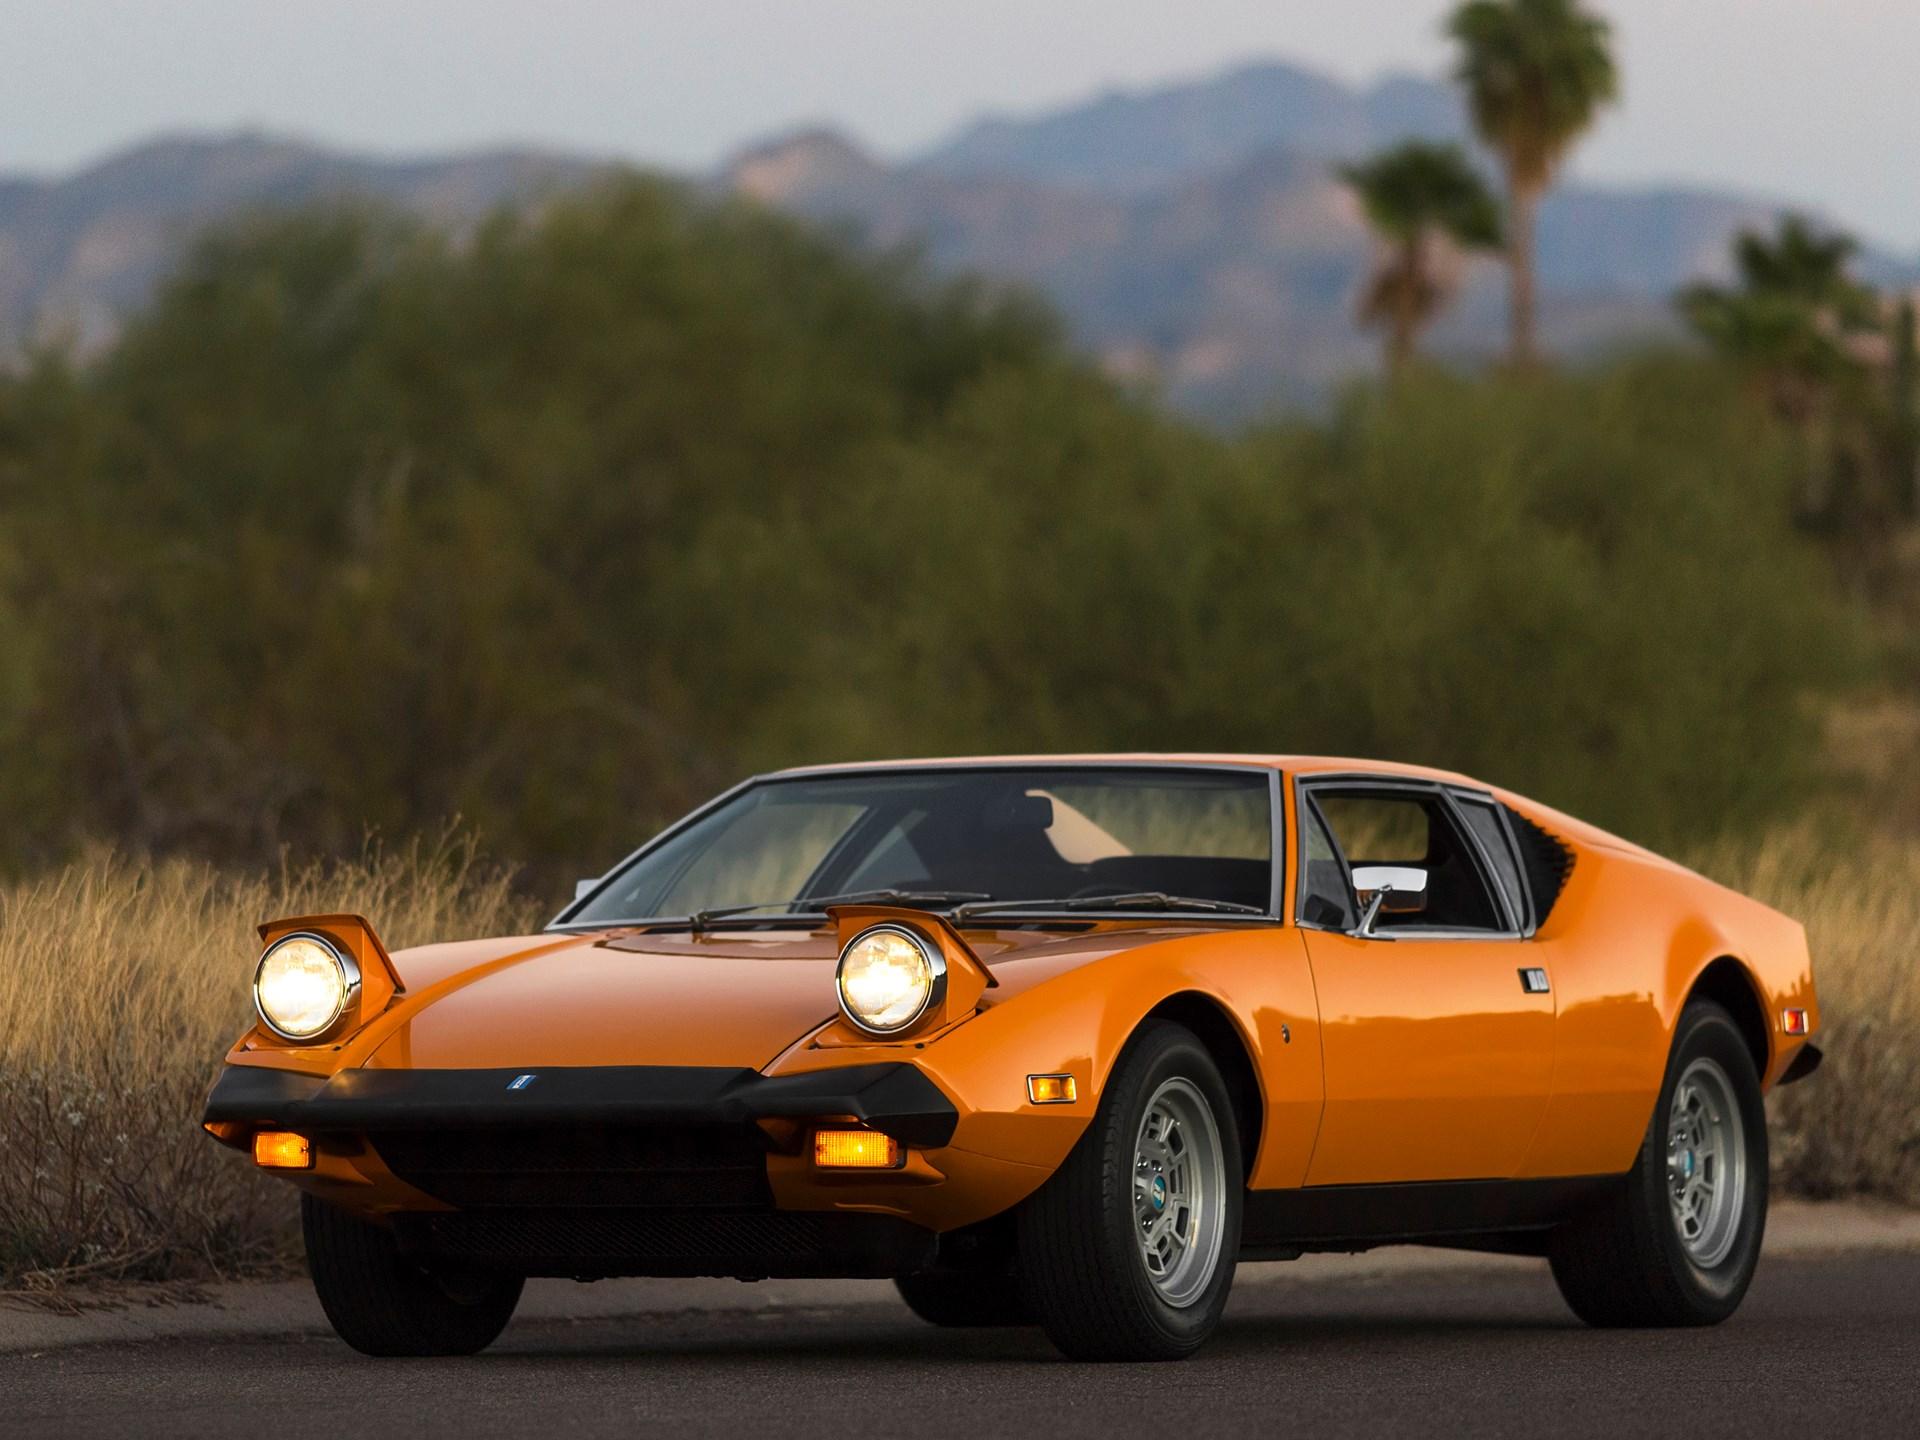 1973 De Tomaso Pantera 3/4 front lights up